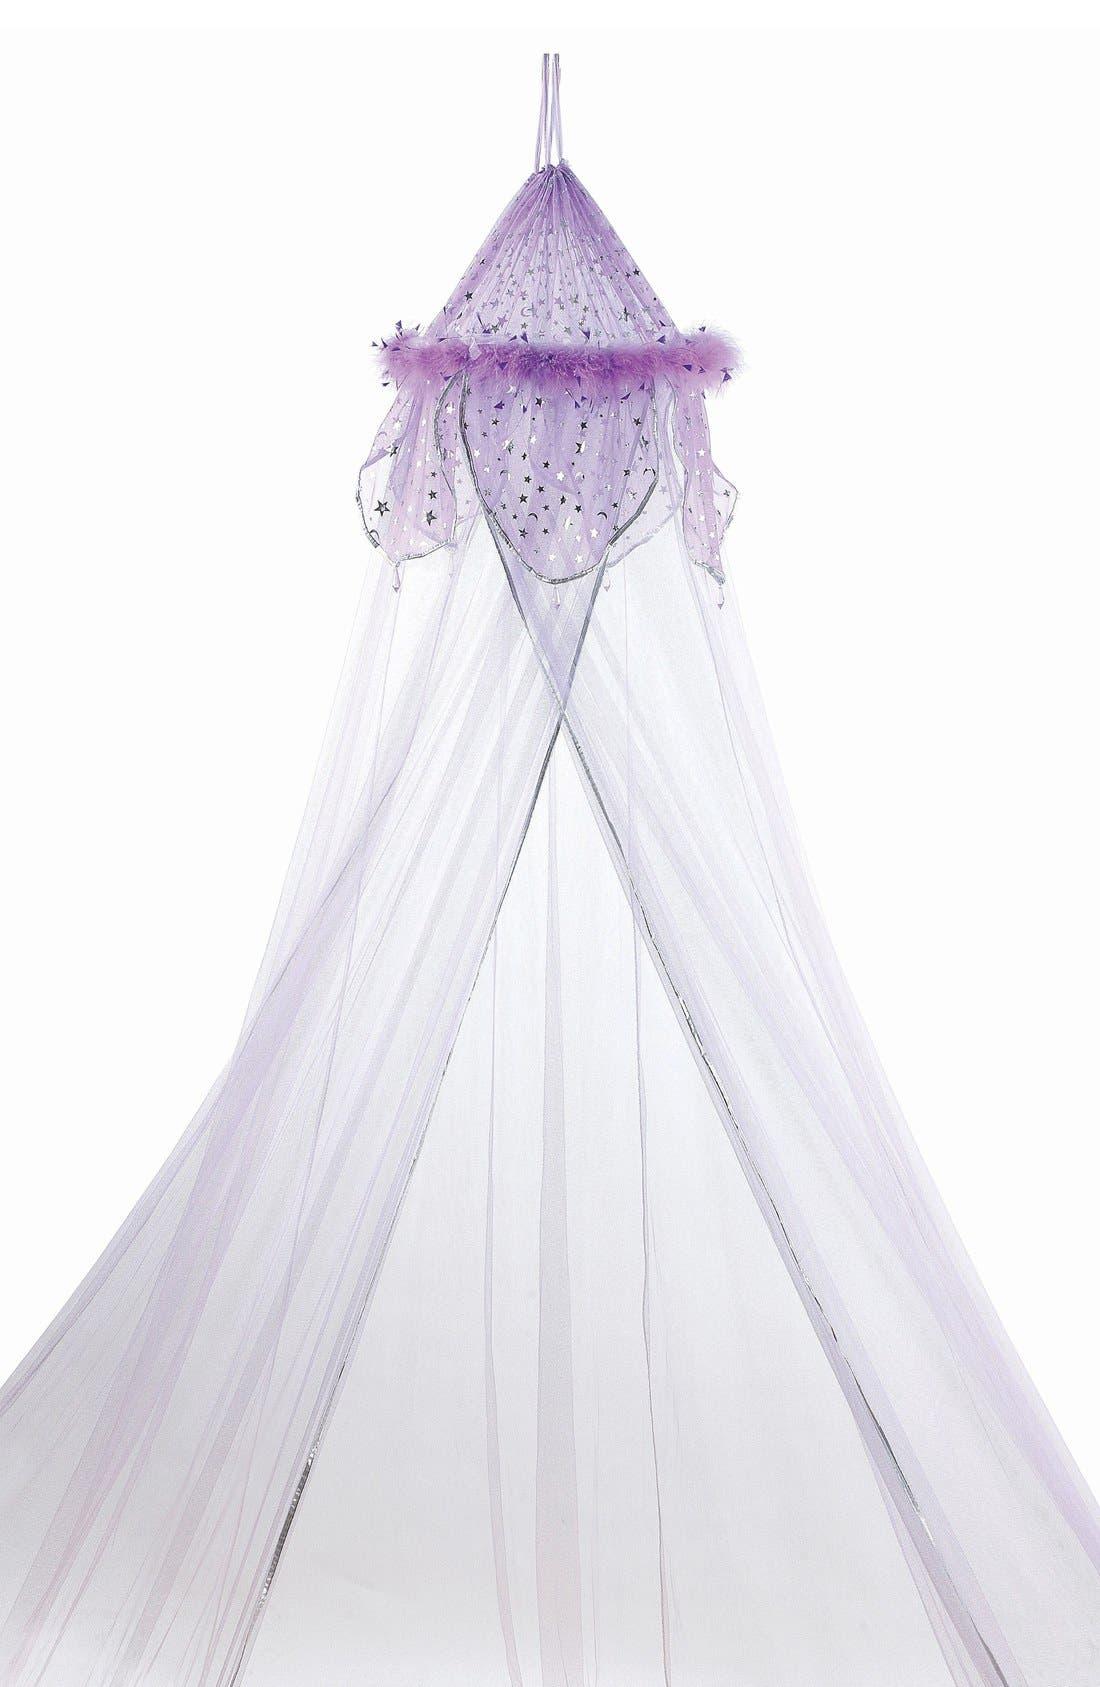 'Lavender Fantasy' Bed Canopy,                         Main,                         color, Lavender